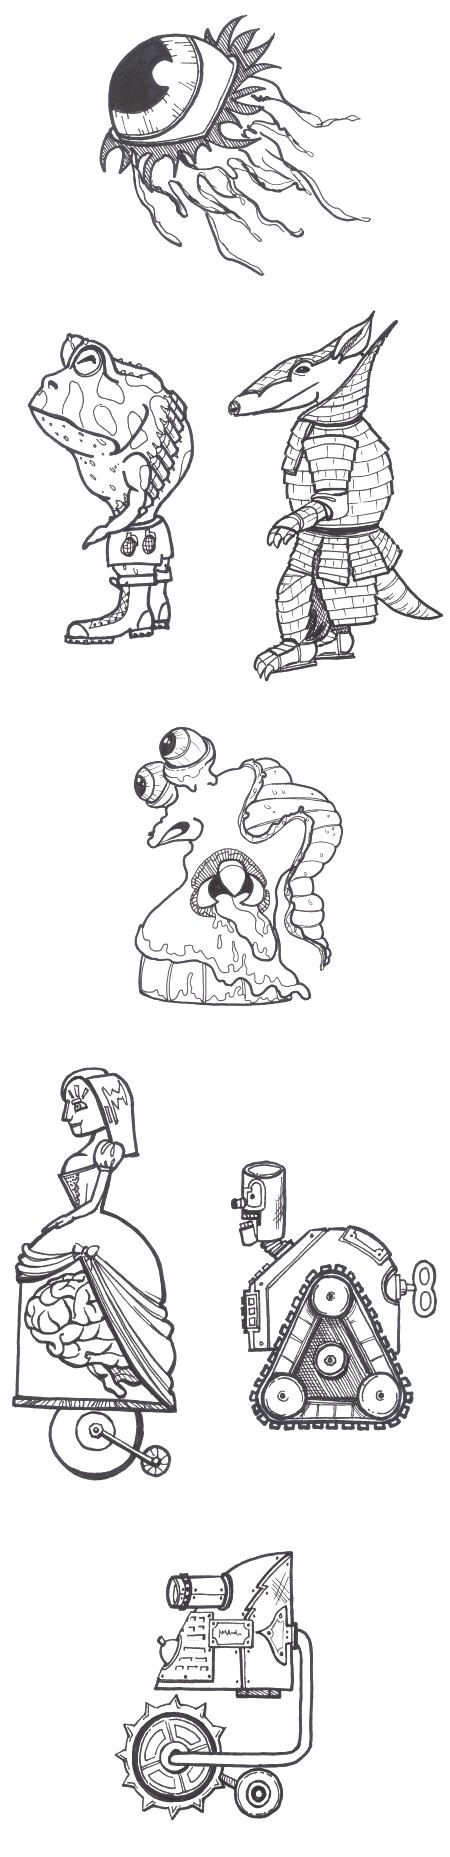 Enemy drawing samples